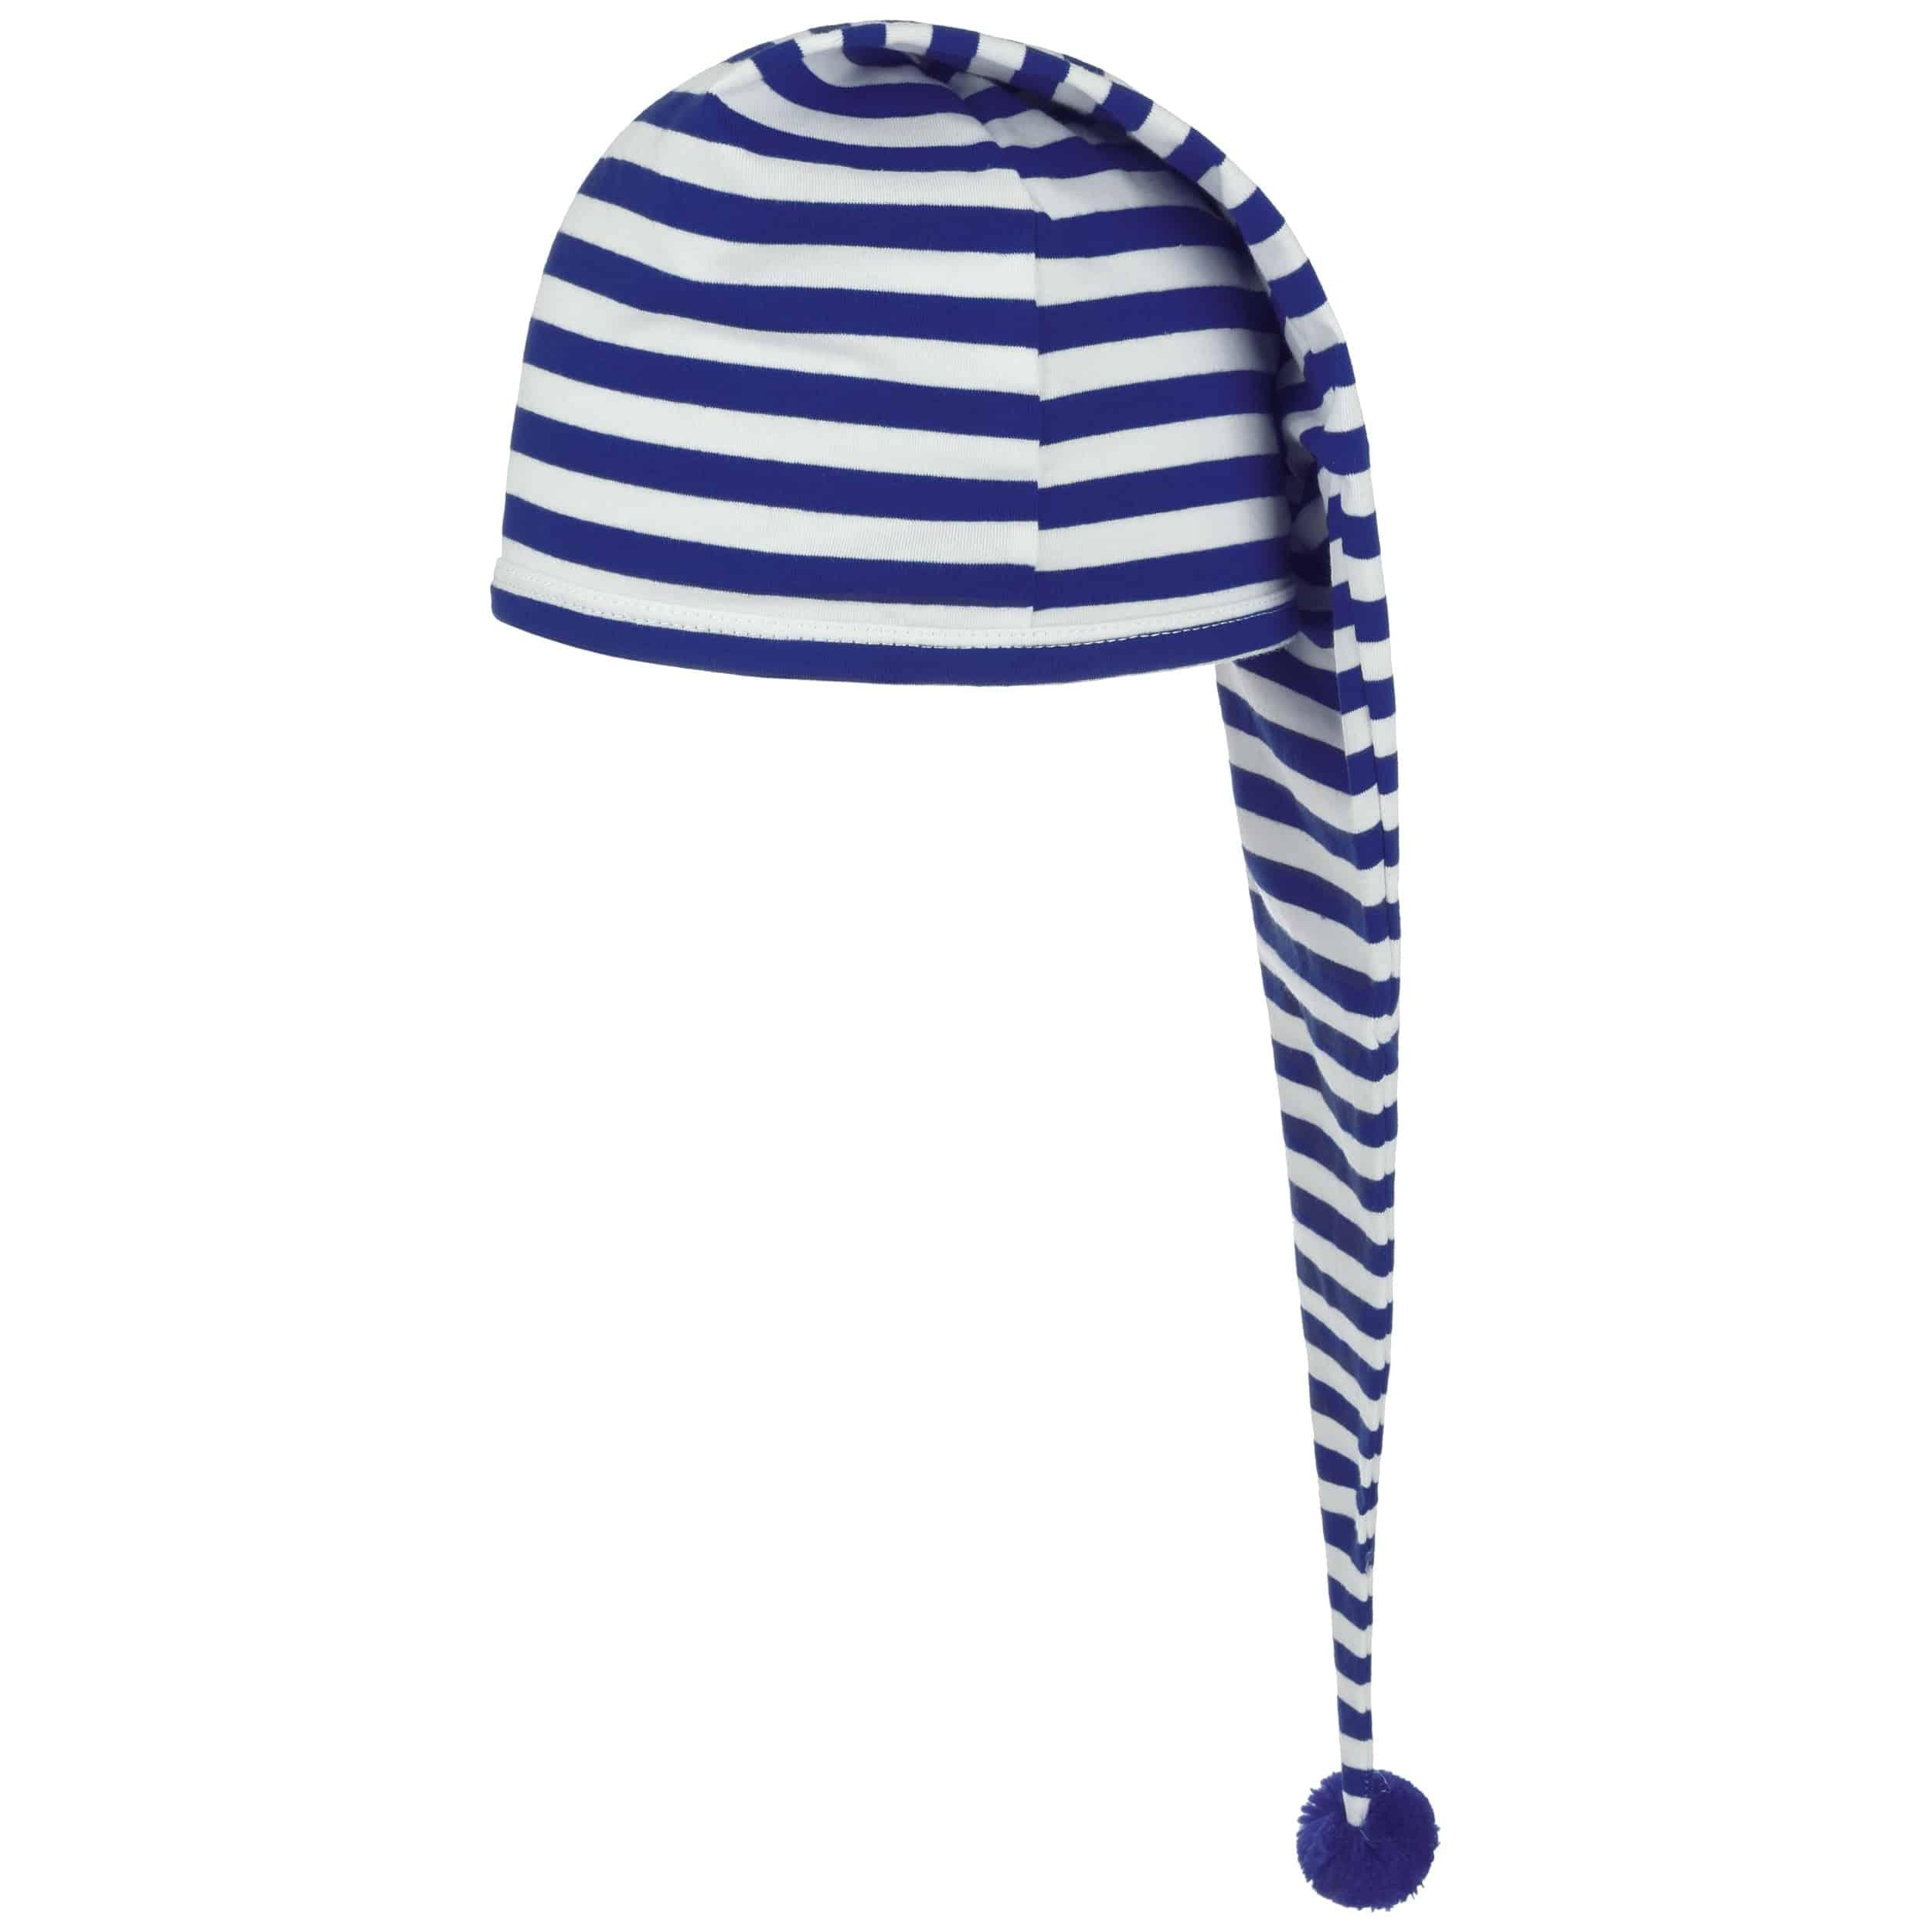 94fbd220ebfeb Gorro para Dormir by Lipodo - Gorros - sombreroshop.es